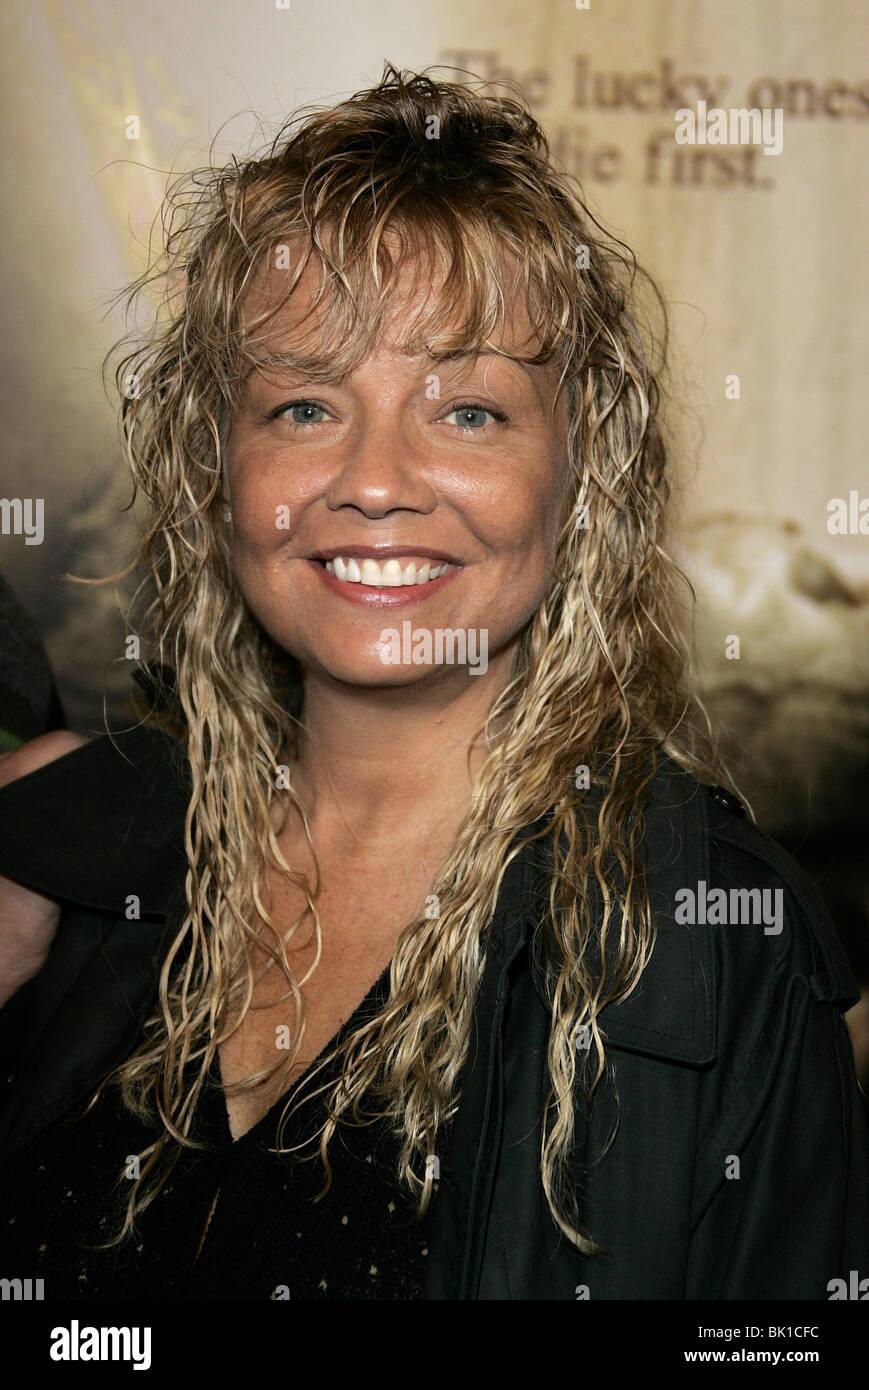 Kelli Maroney